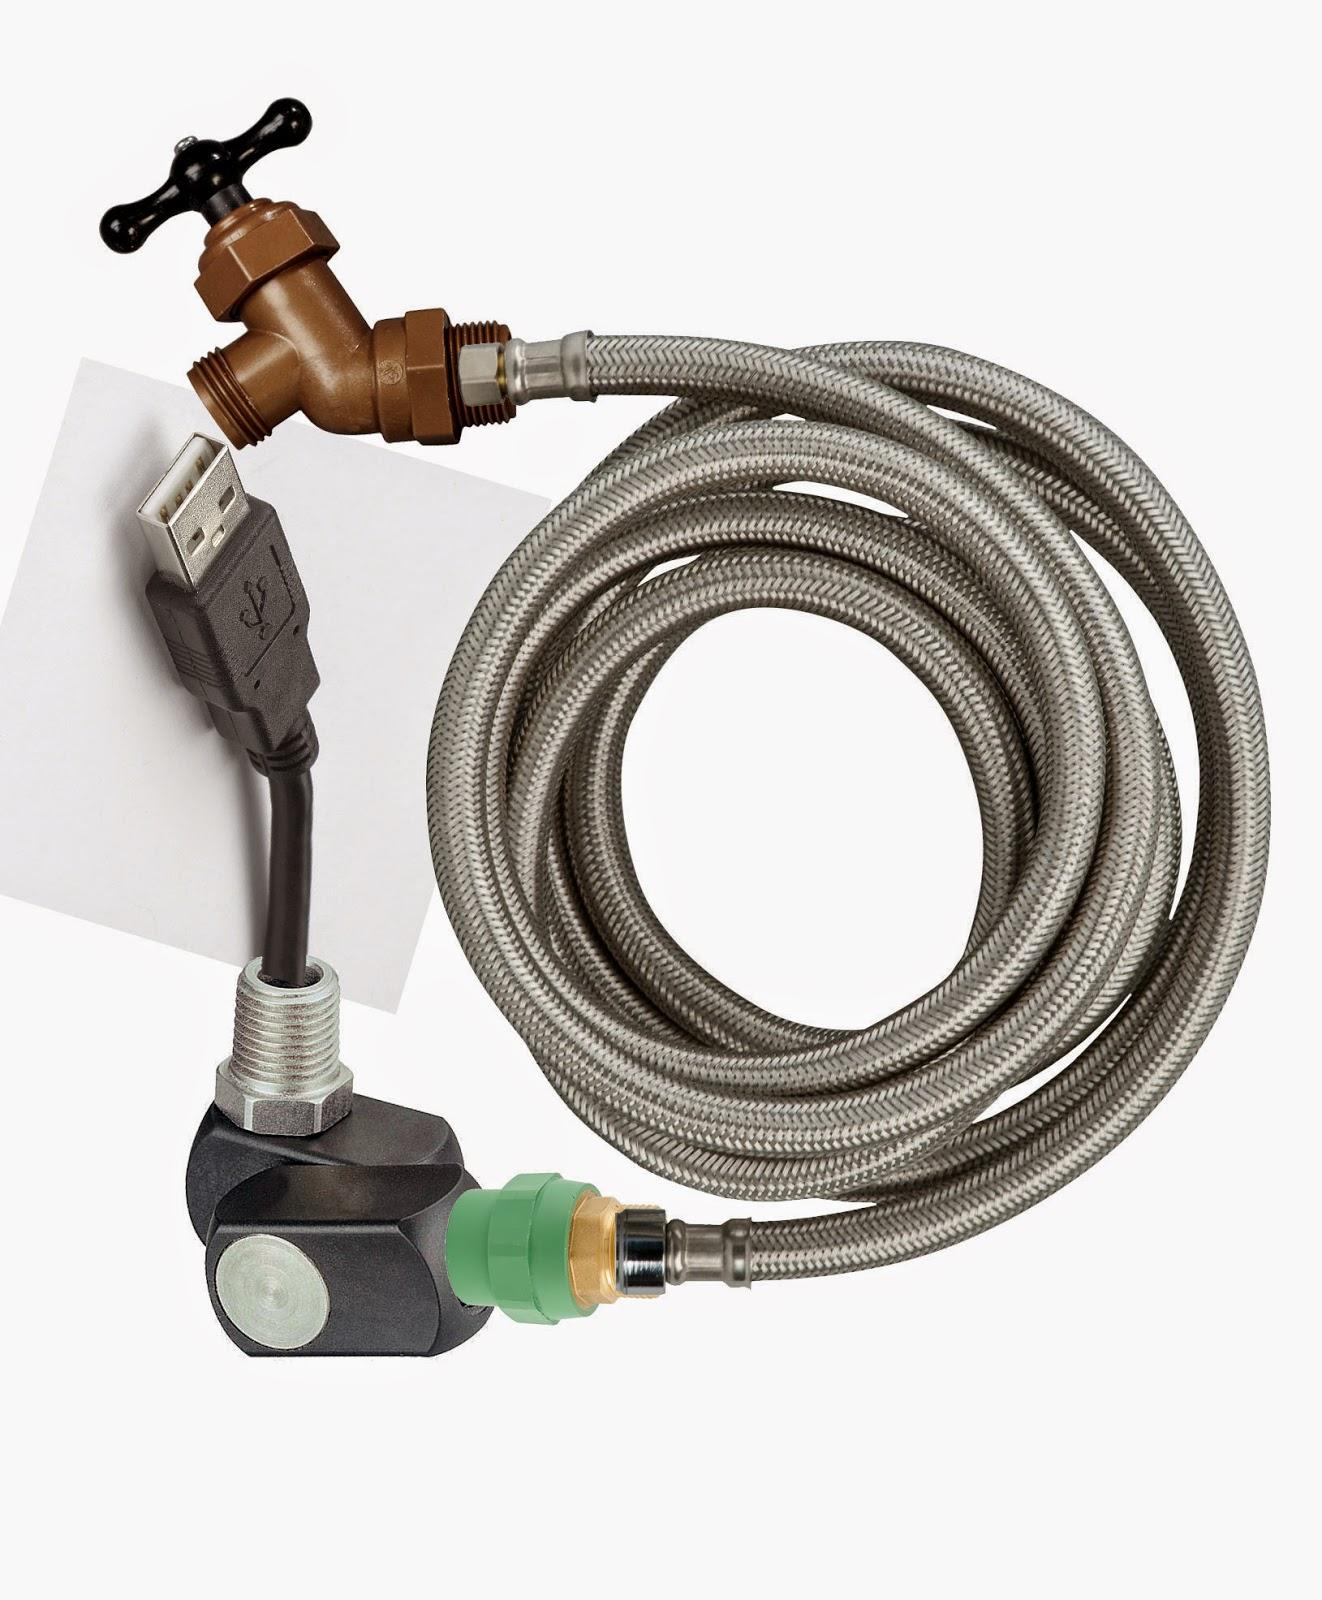 USB plug-n-pour water generator